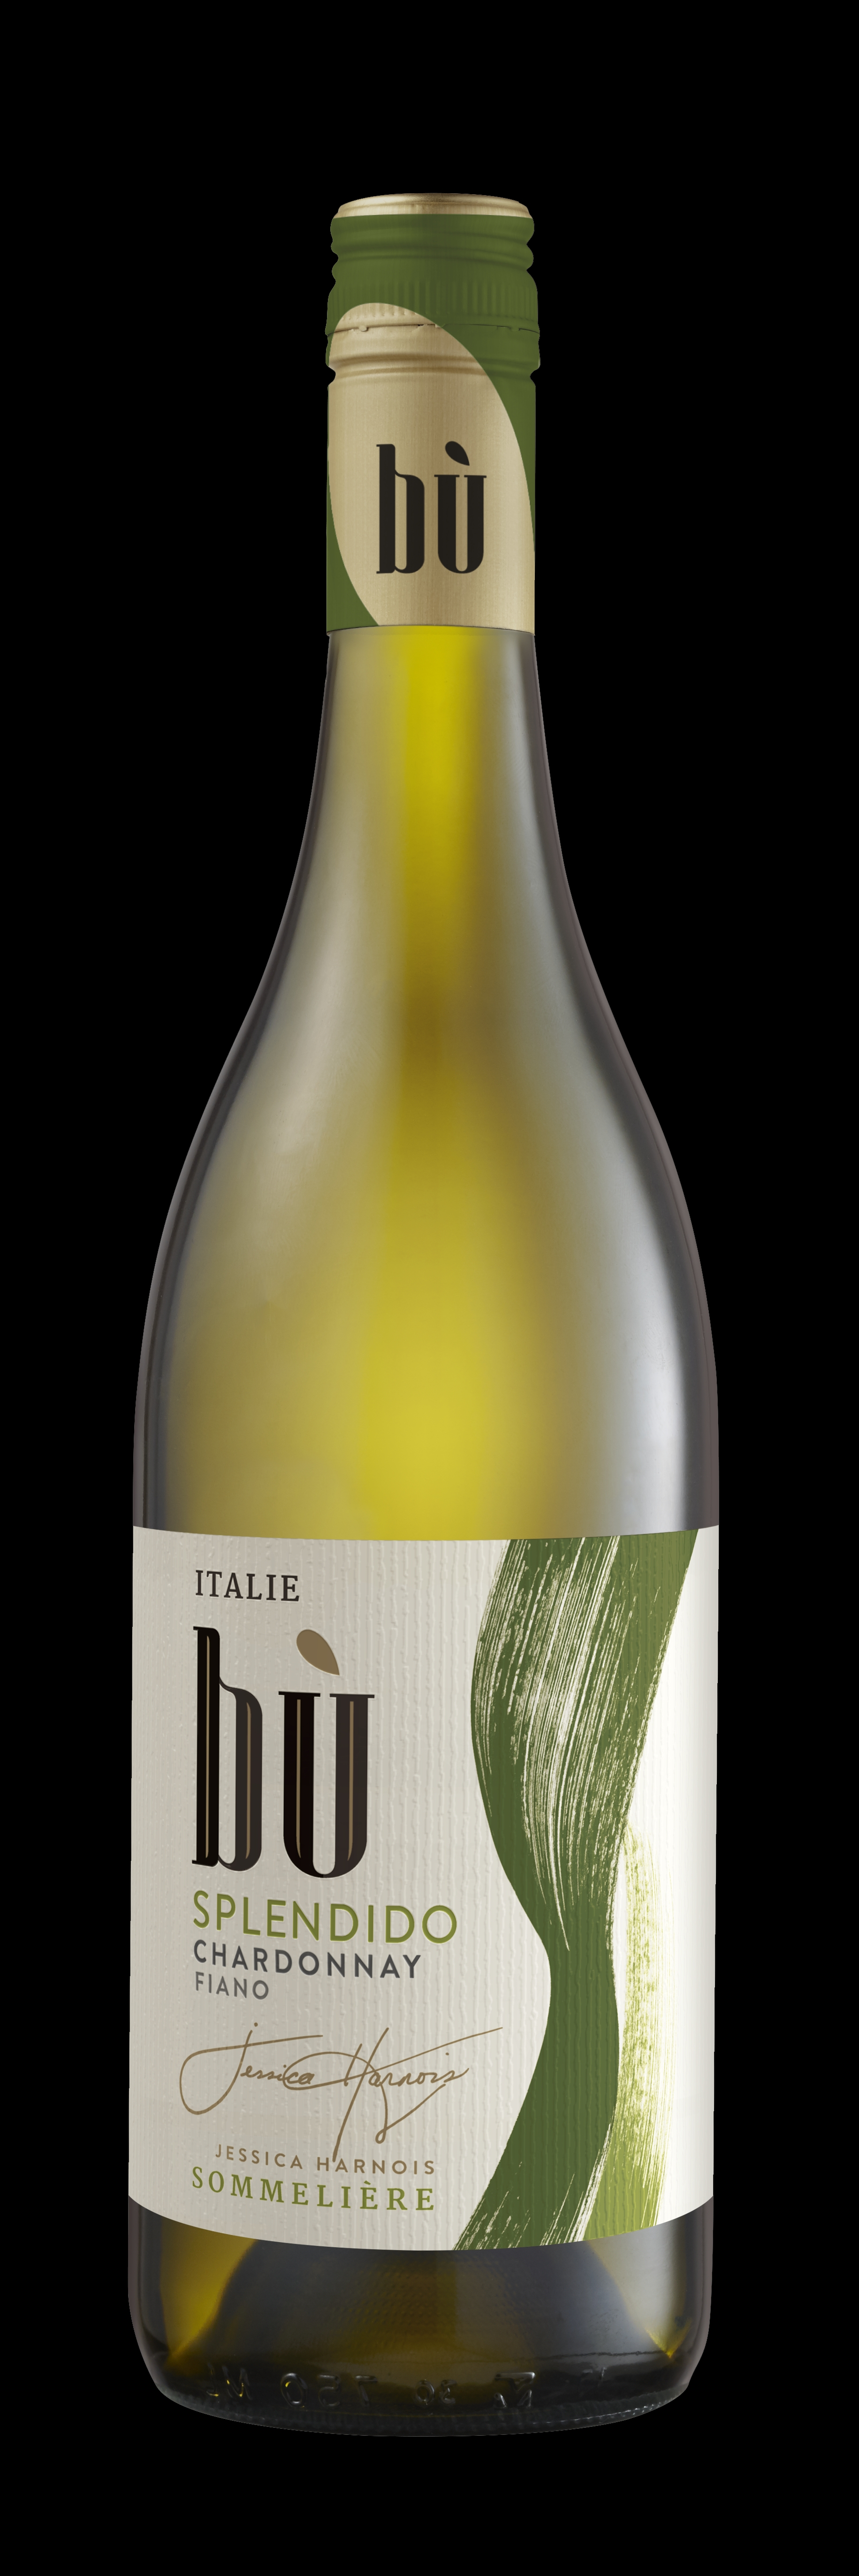 Bu Splendido ChardonnayFiano SAQ.jpg